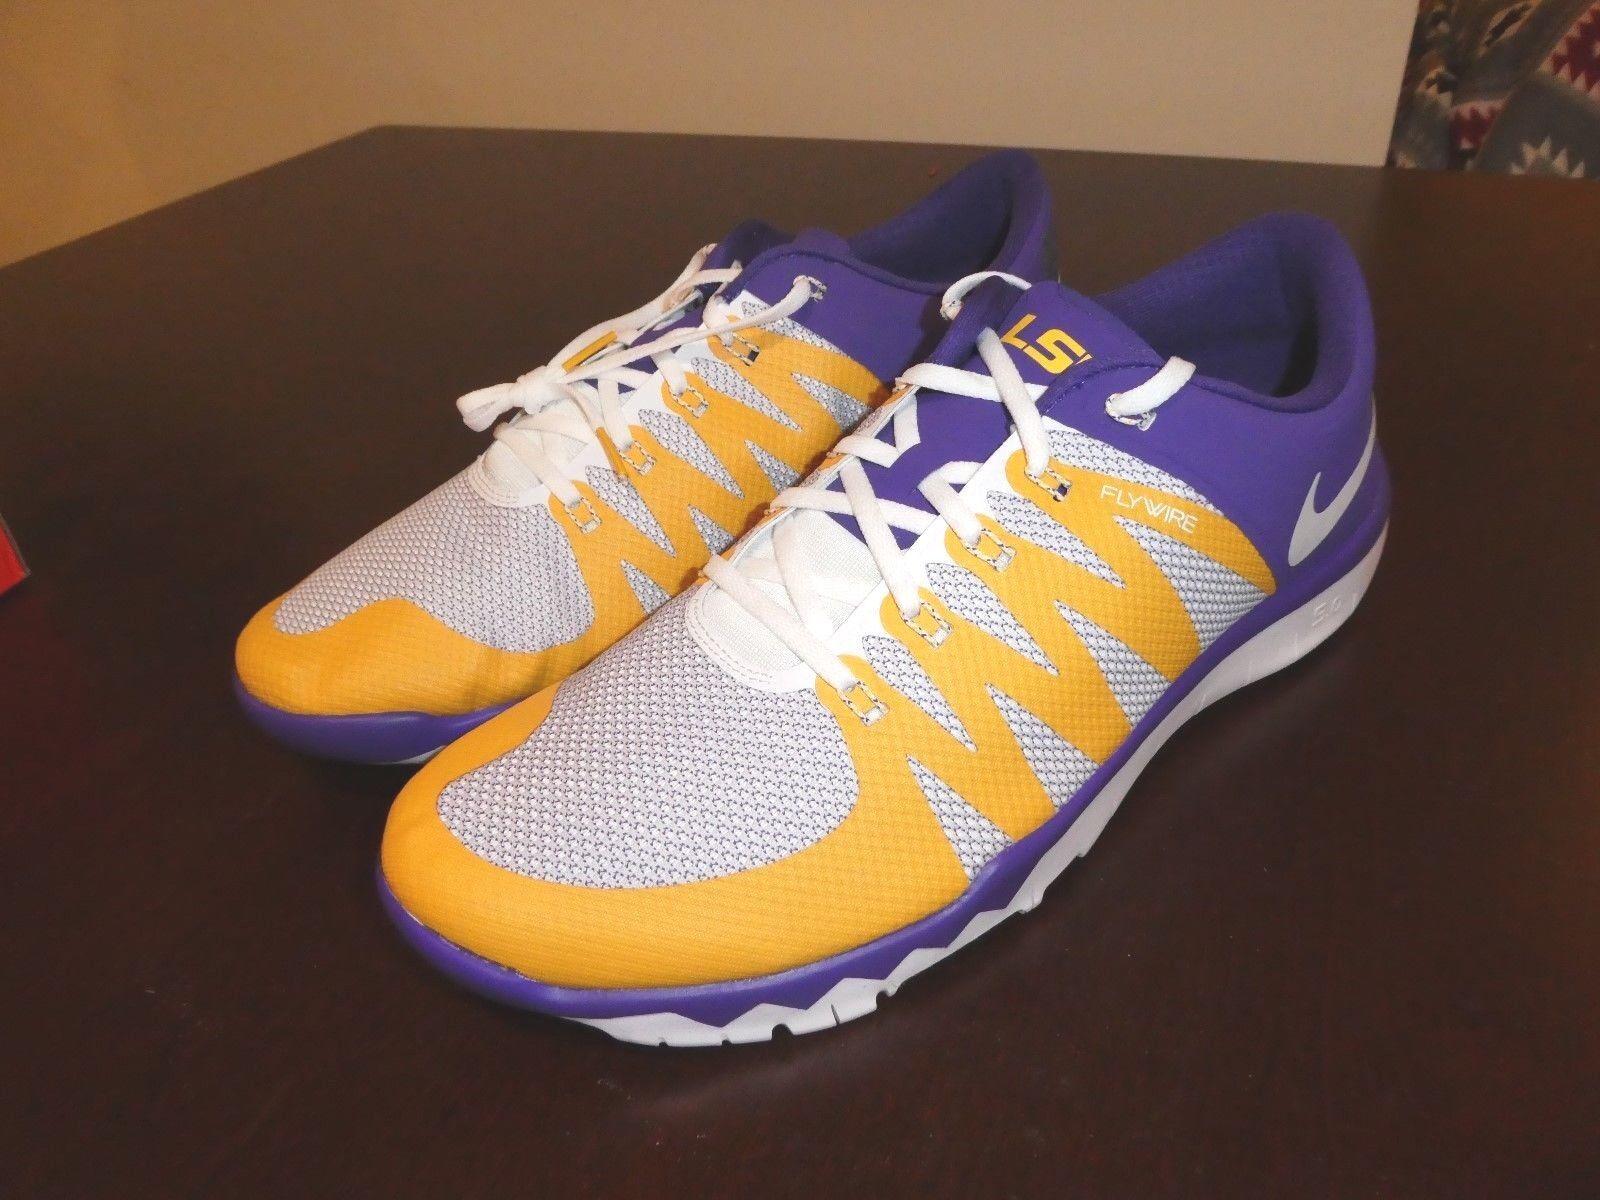 Nike Trainer Free 5.0 V6 AMP shoes New 723939 571 Lousiana Tigers LSU sz 15